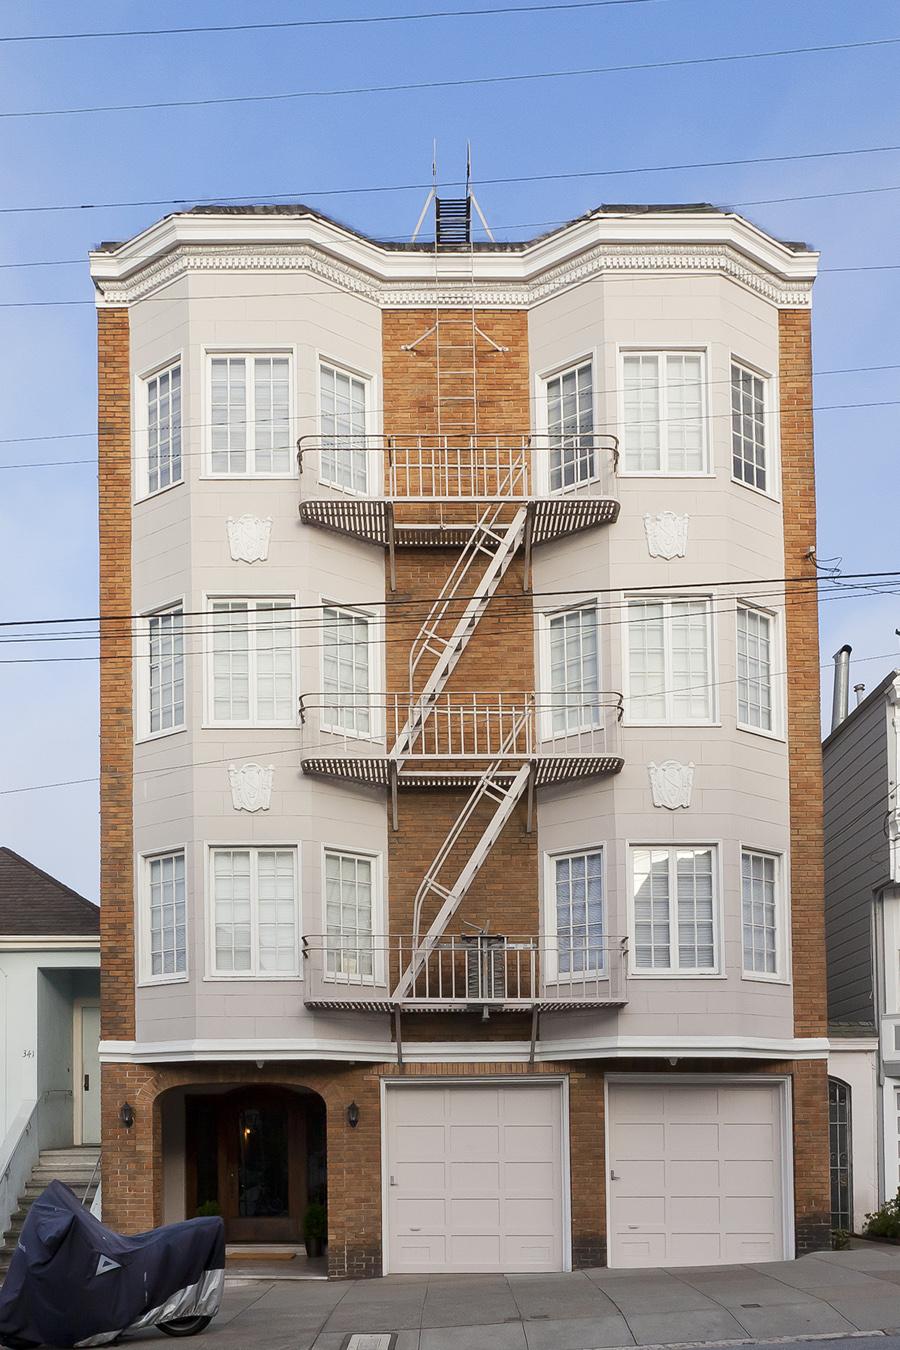 337 10th Ave, San Francisco